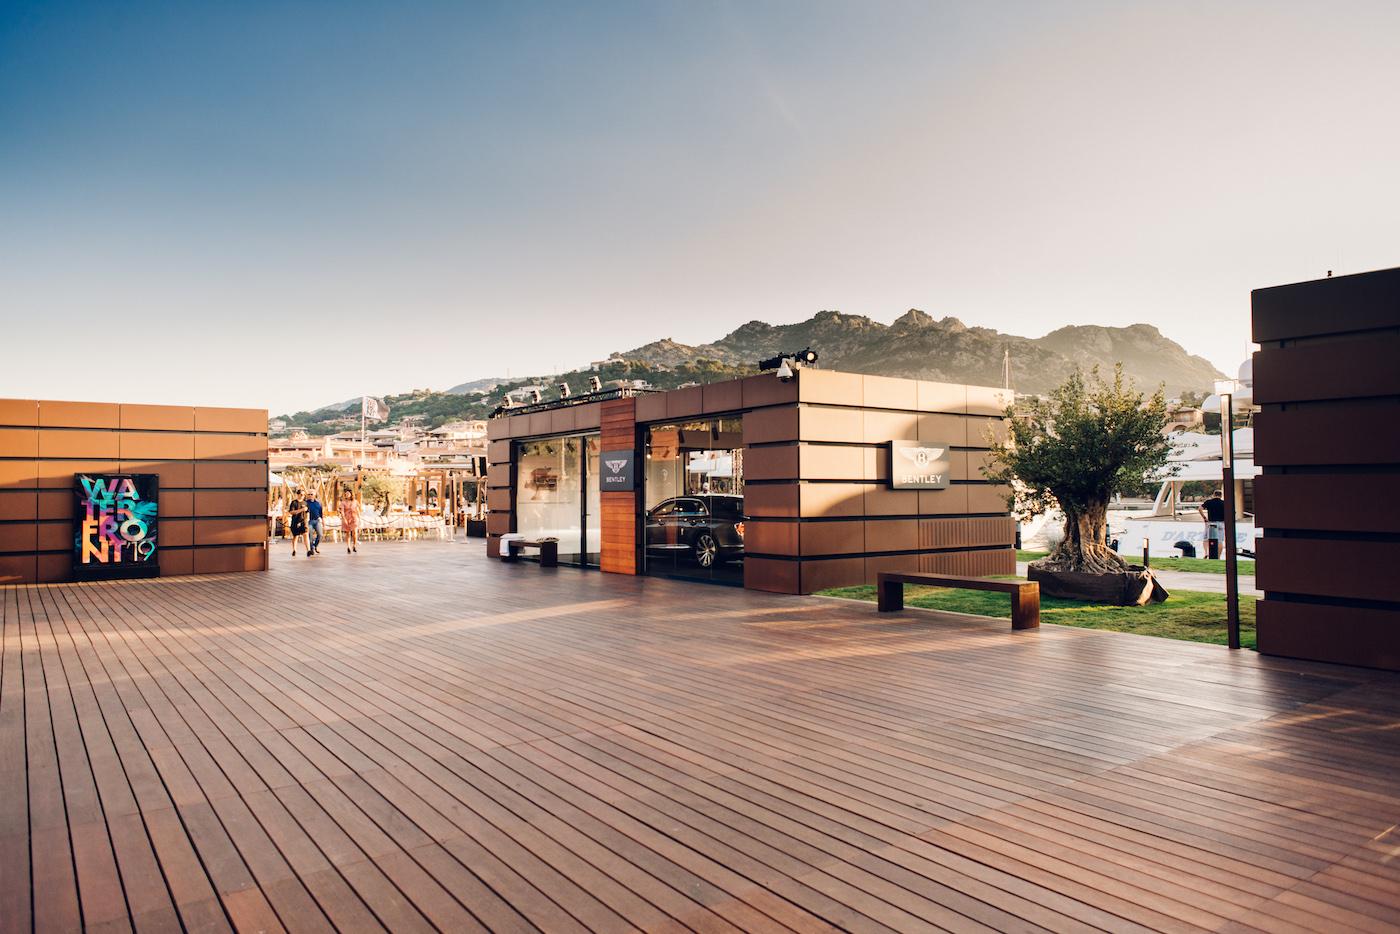 Mit Bentley in Porto Cervo: Die Bentley Summer Tour 2019 8